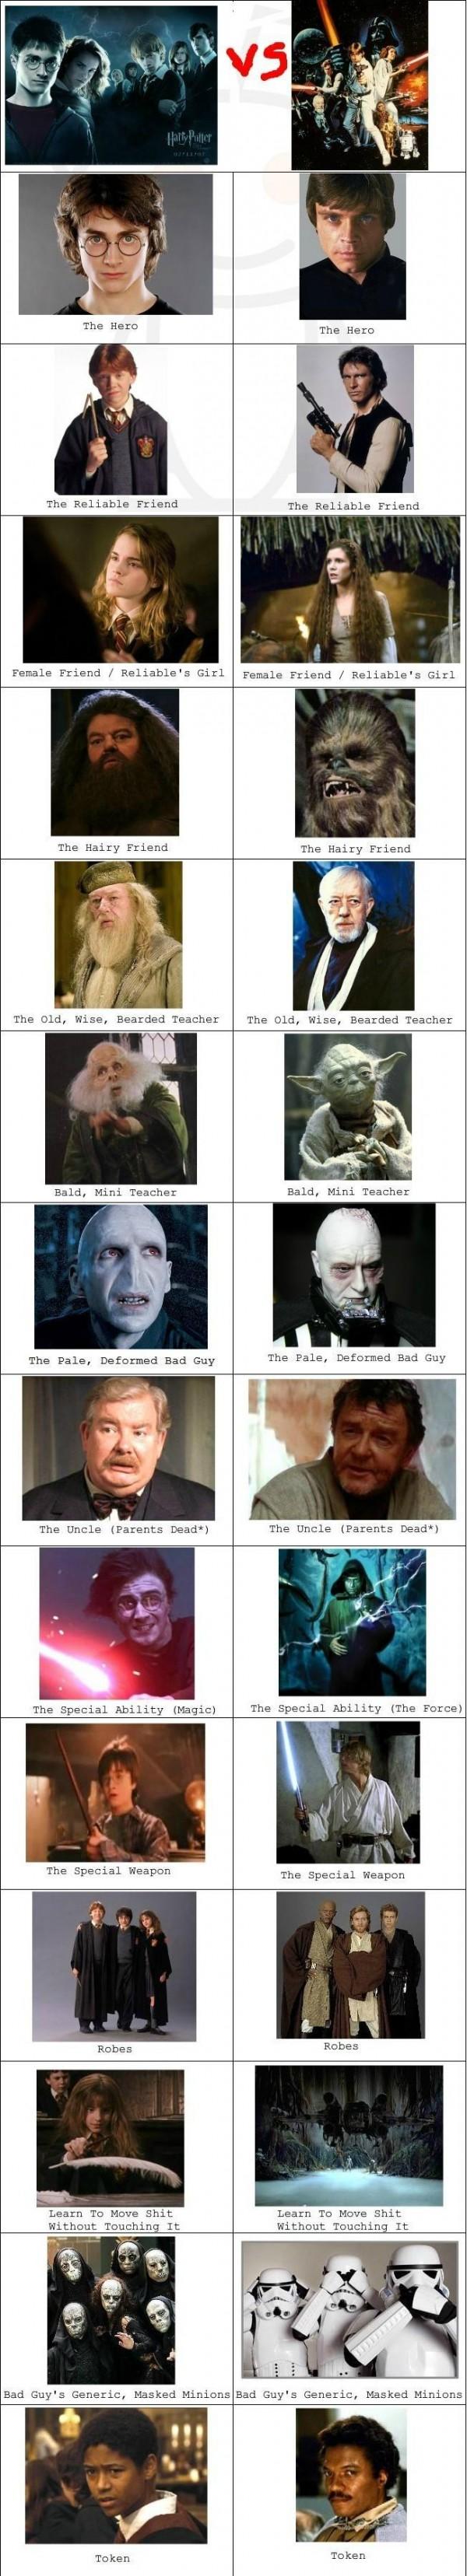 Harry Potter vs Star Wars